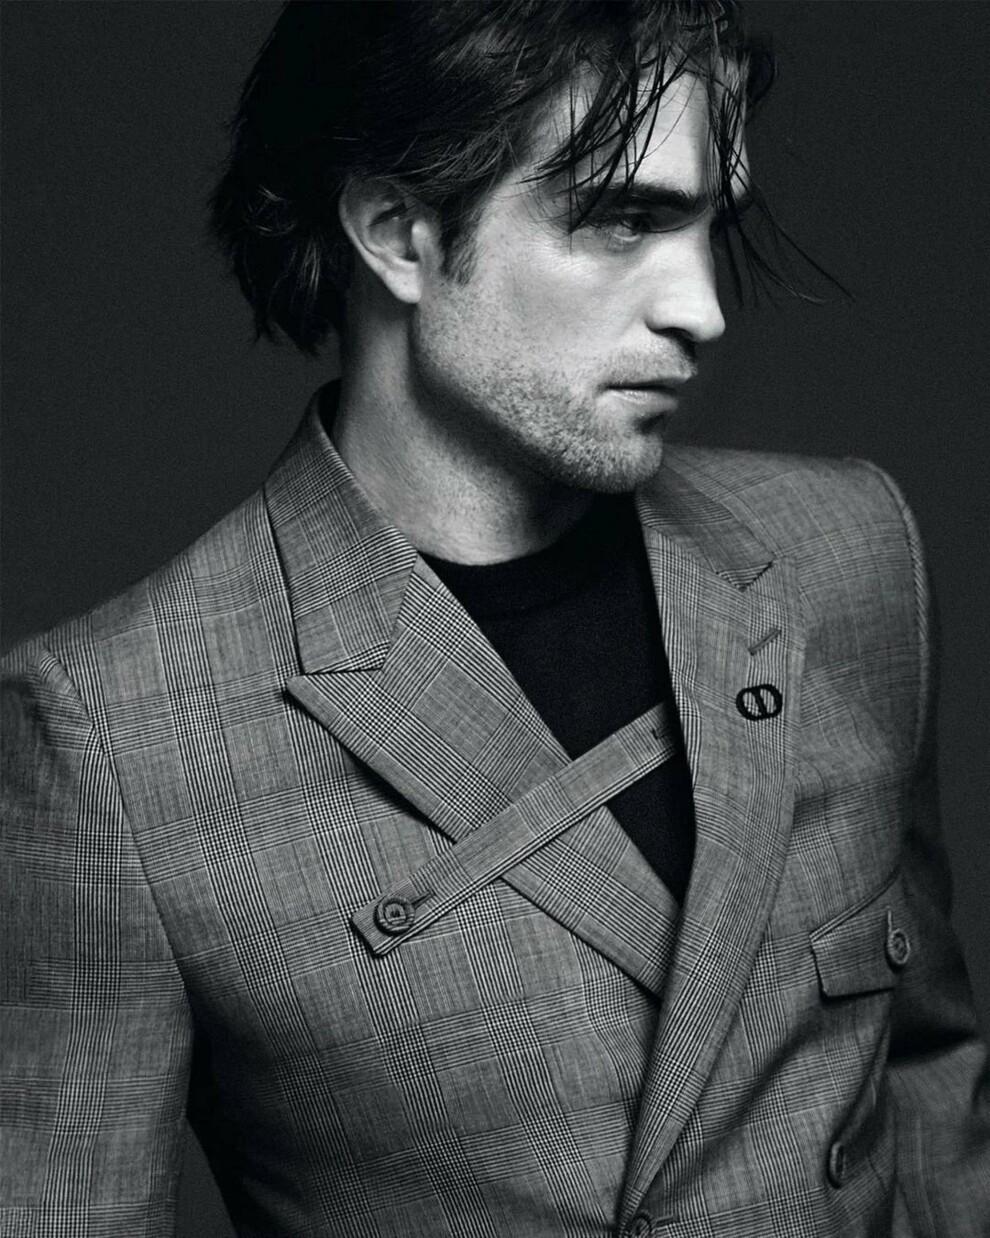 Любуемся: Роберт Паттинсон снялся в рекламной кампании Dior Homme (ФОТО) - фото №1